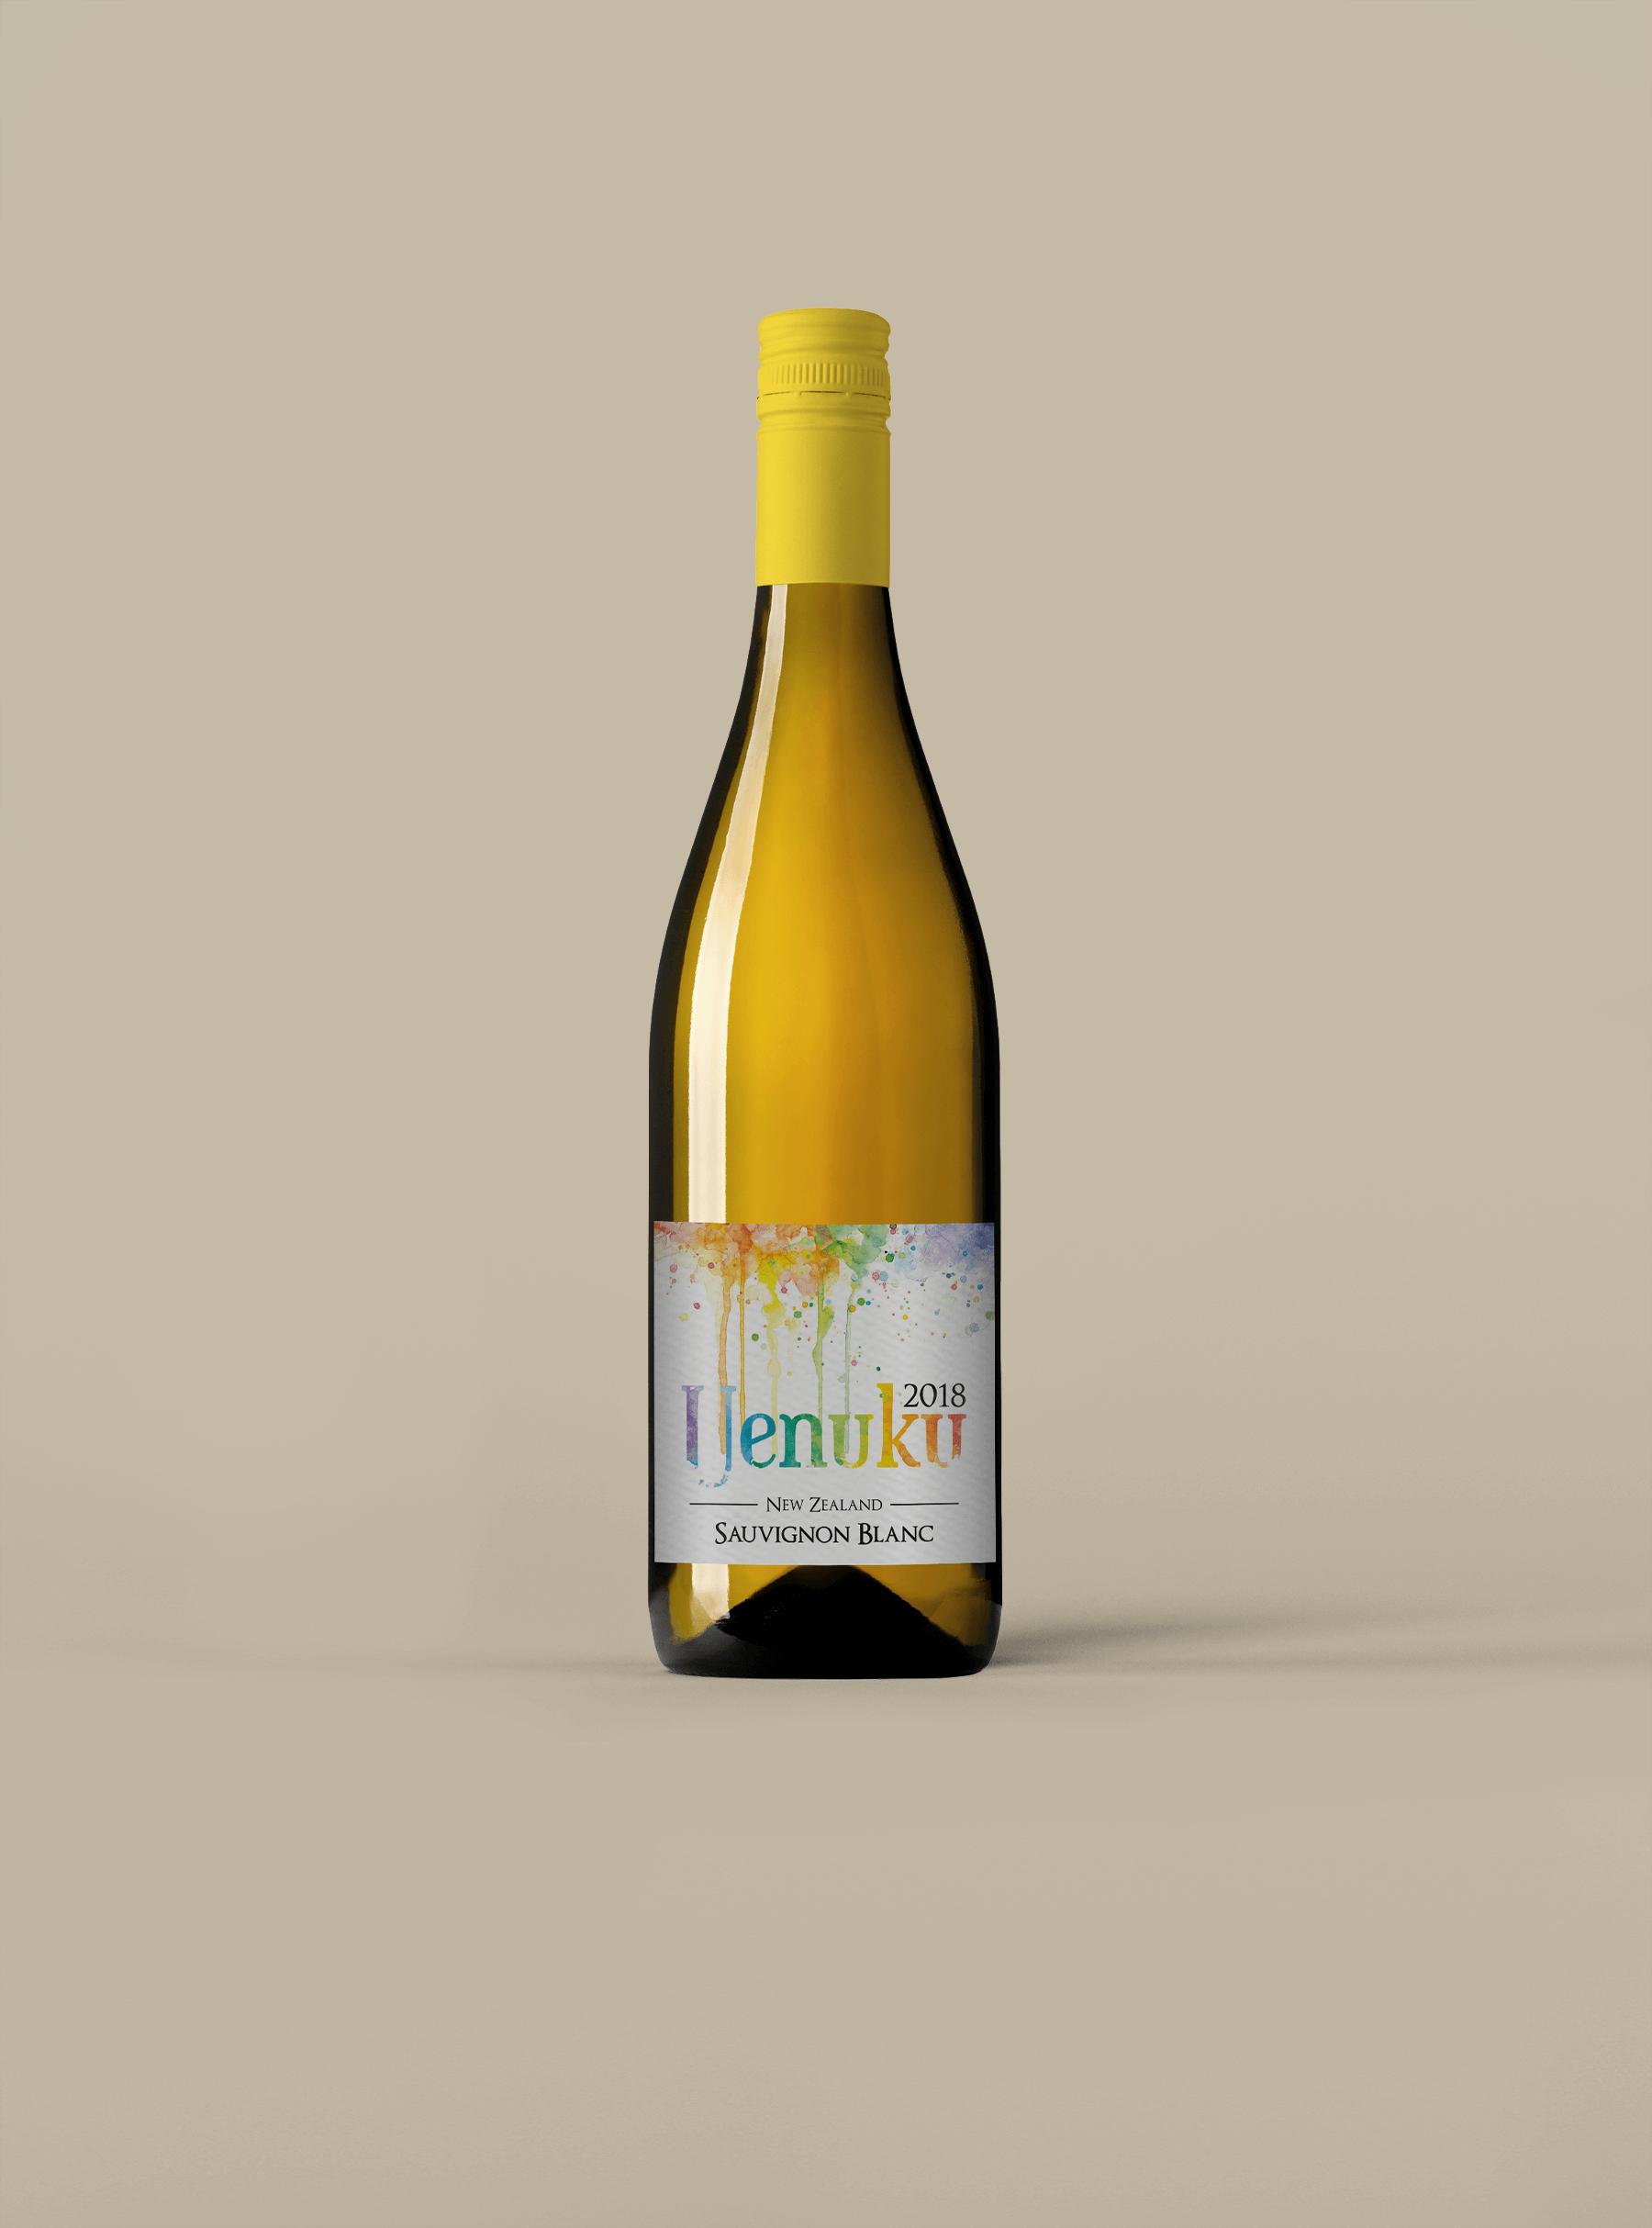 Uenuku New Zealand Sauvignon Blanc